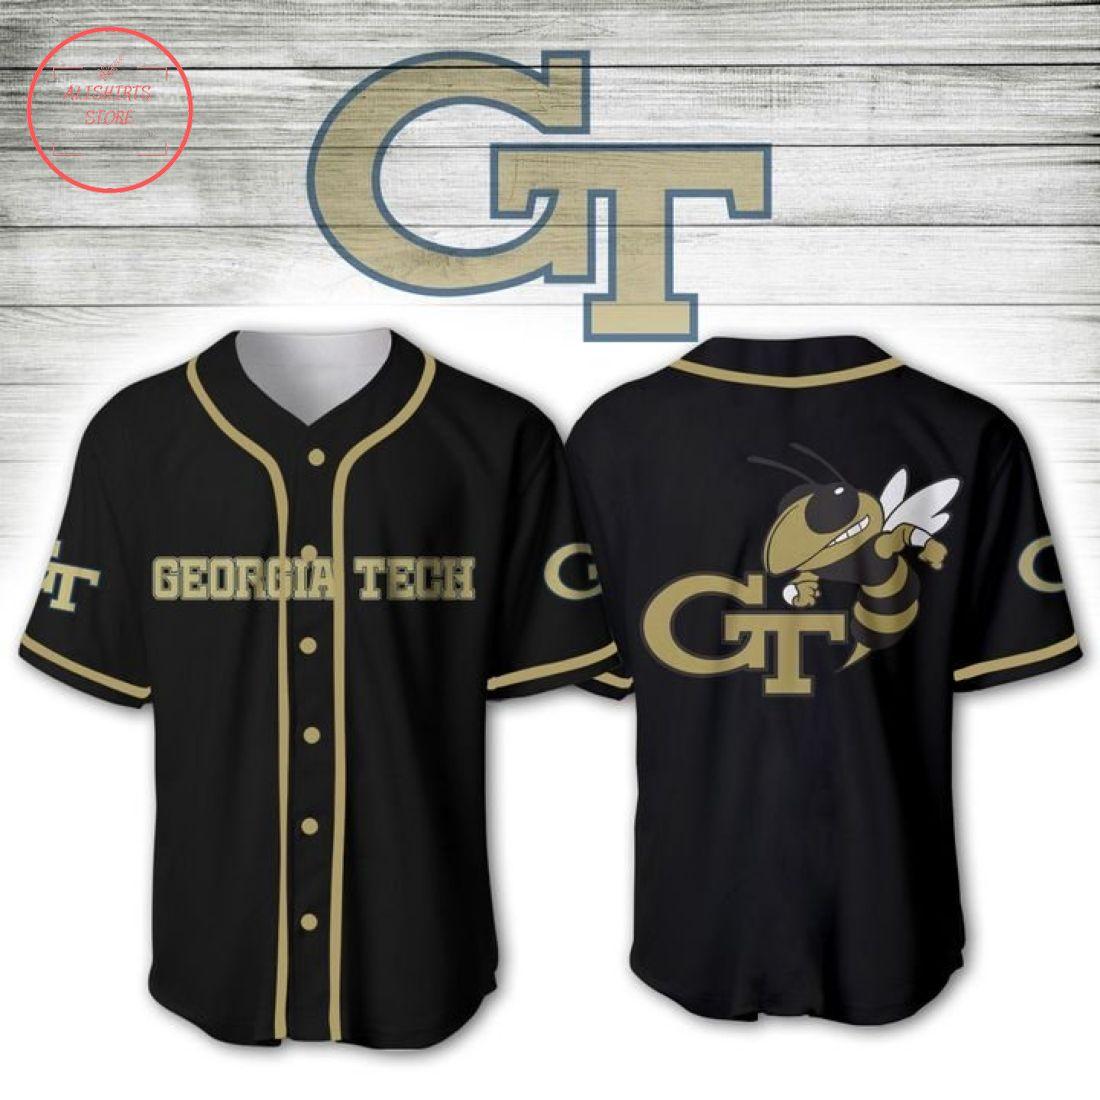 Georgia Tech Yellow Jackets NCAA Baseball Jersey